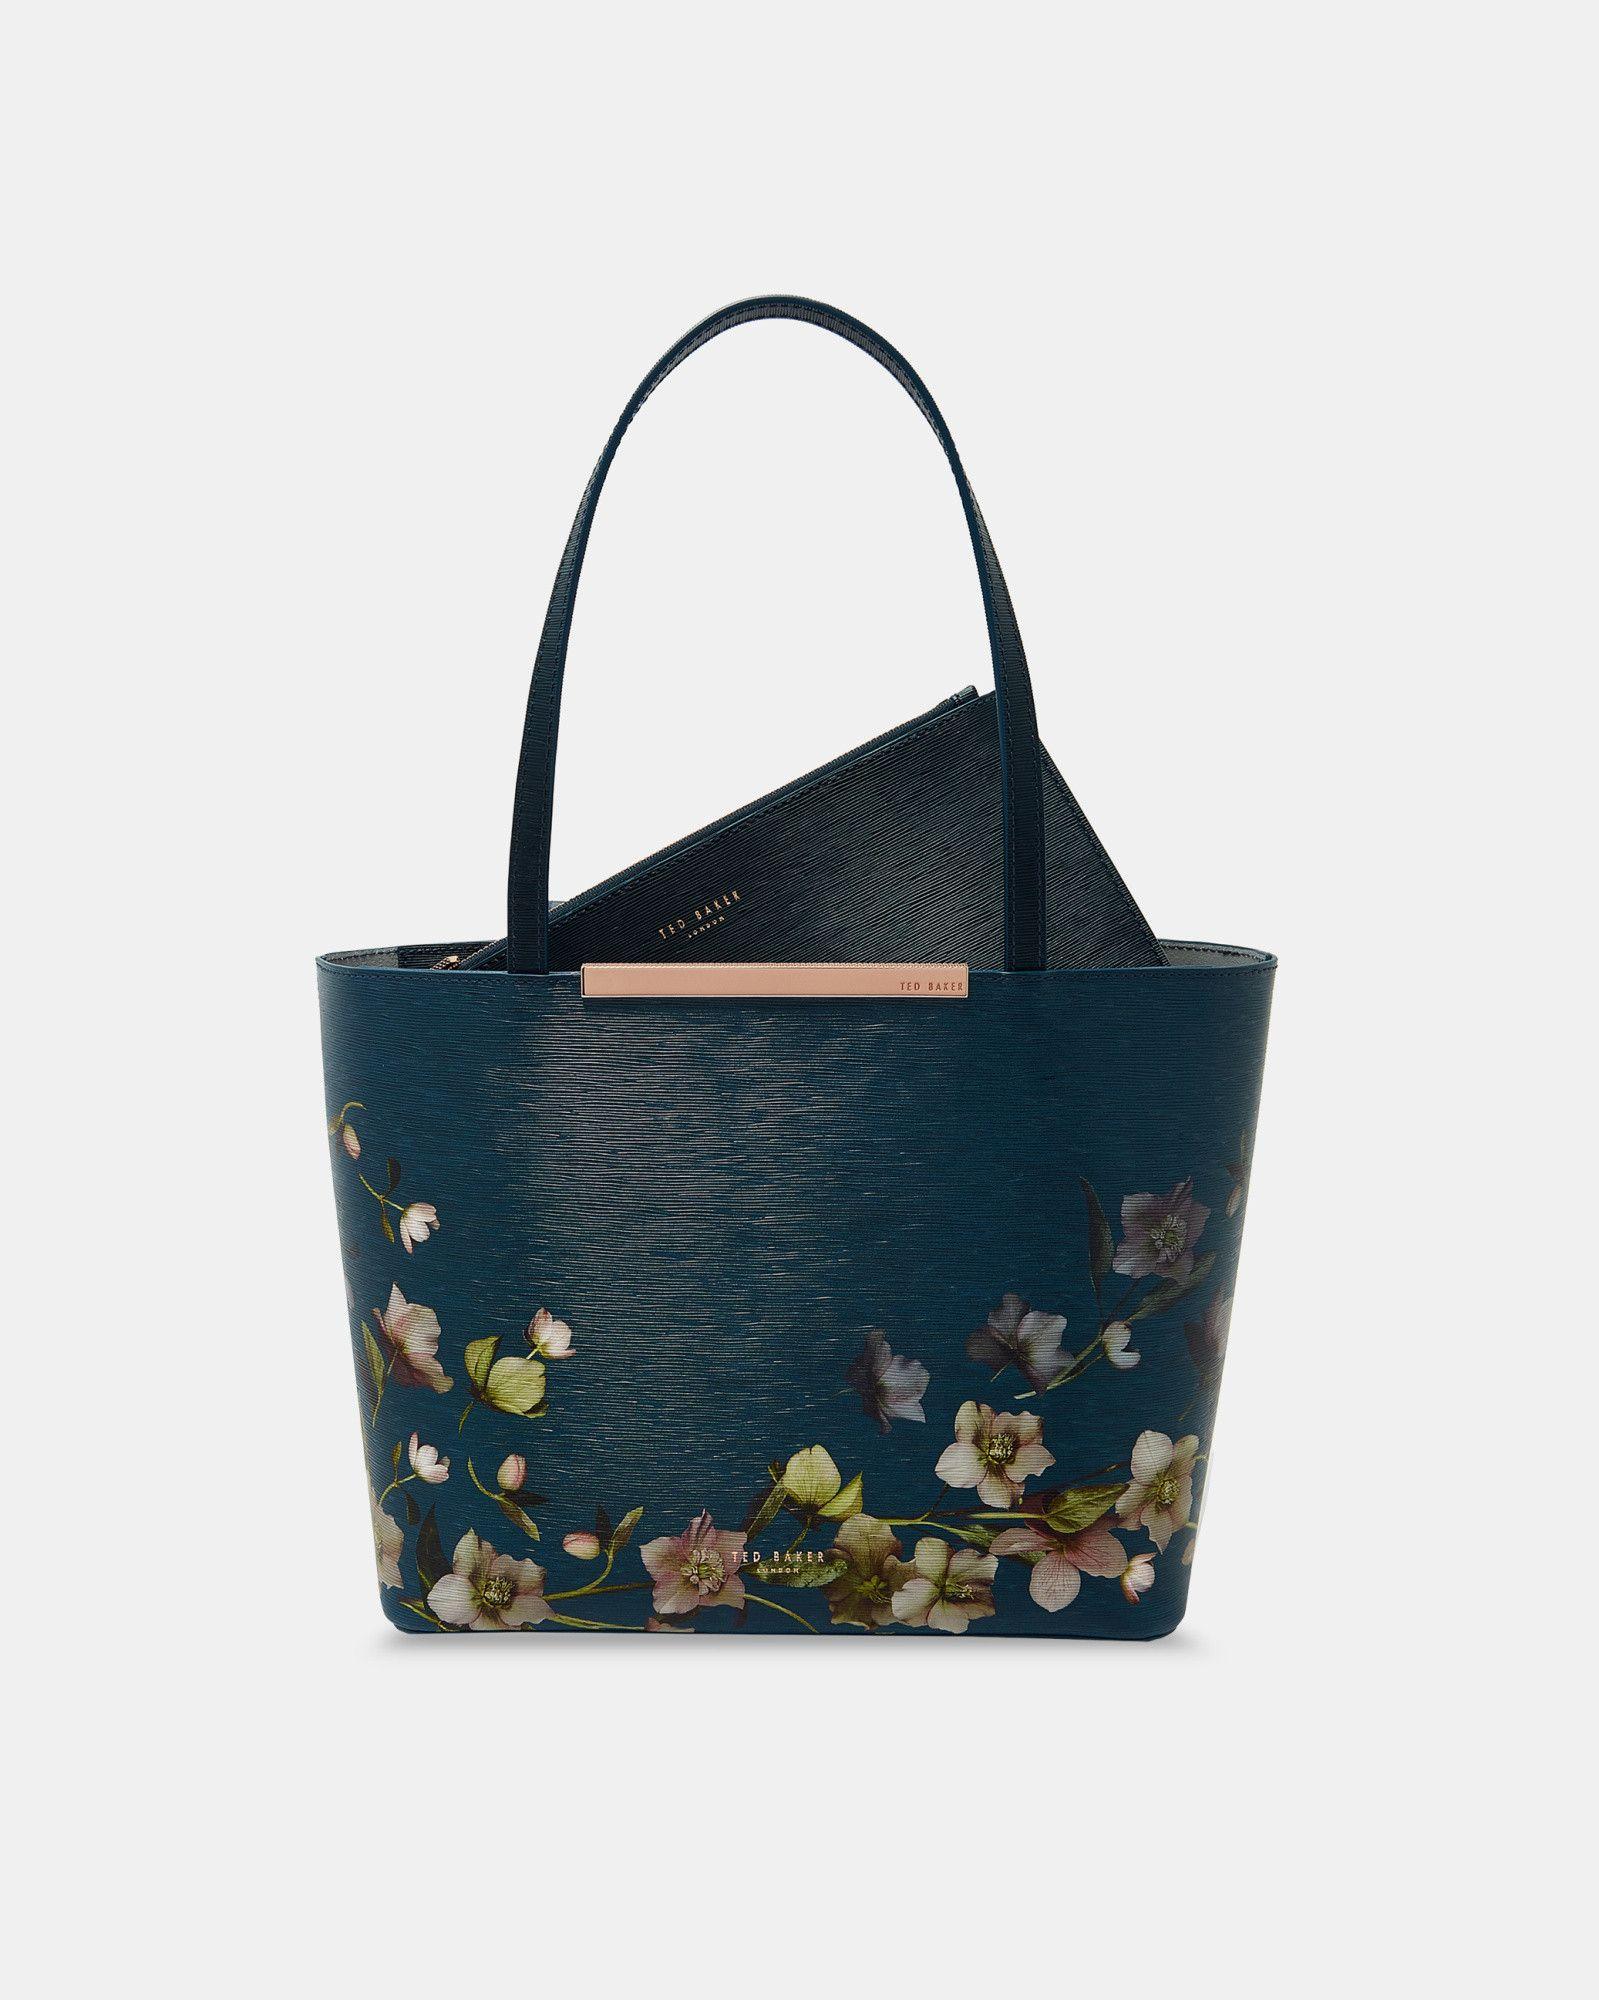 3c02e39577b73 Shantal arboretum mini leather shopper bag tedtotoe gleam glam jpg  1599x2000 Ted baker ikon bag